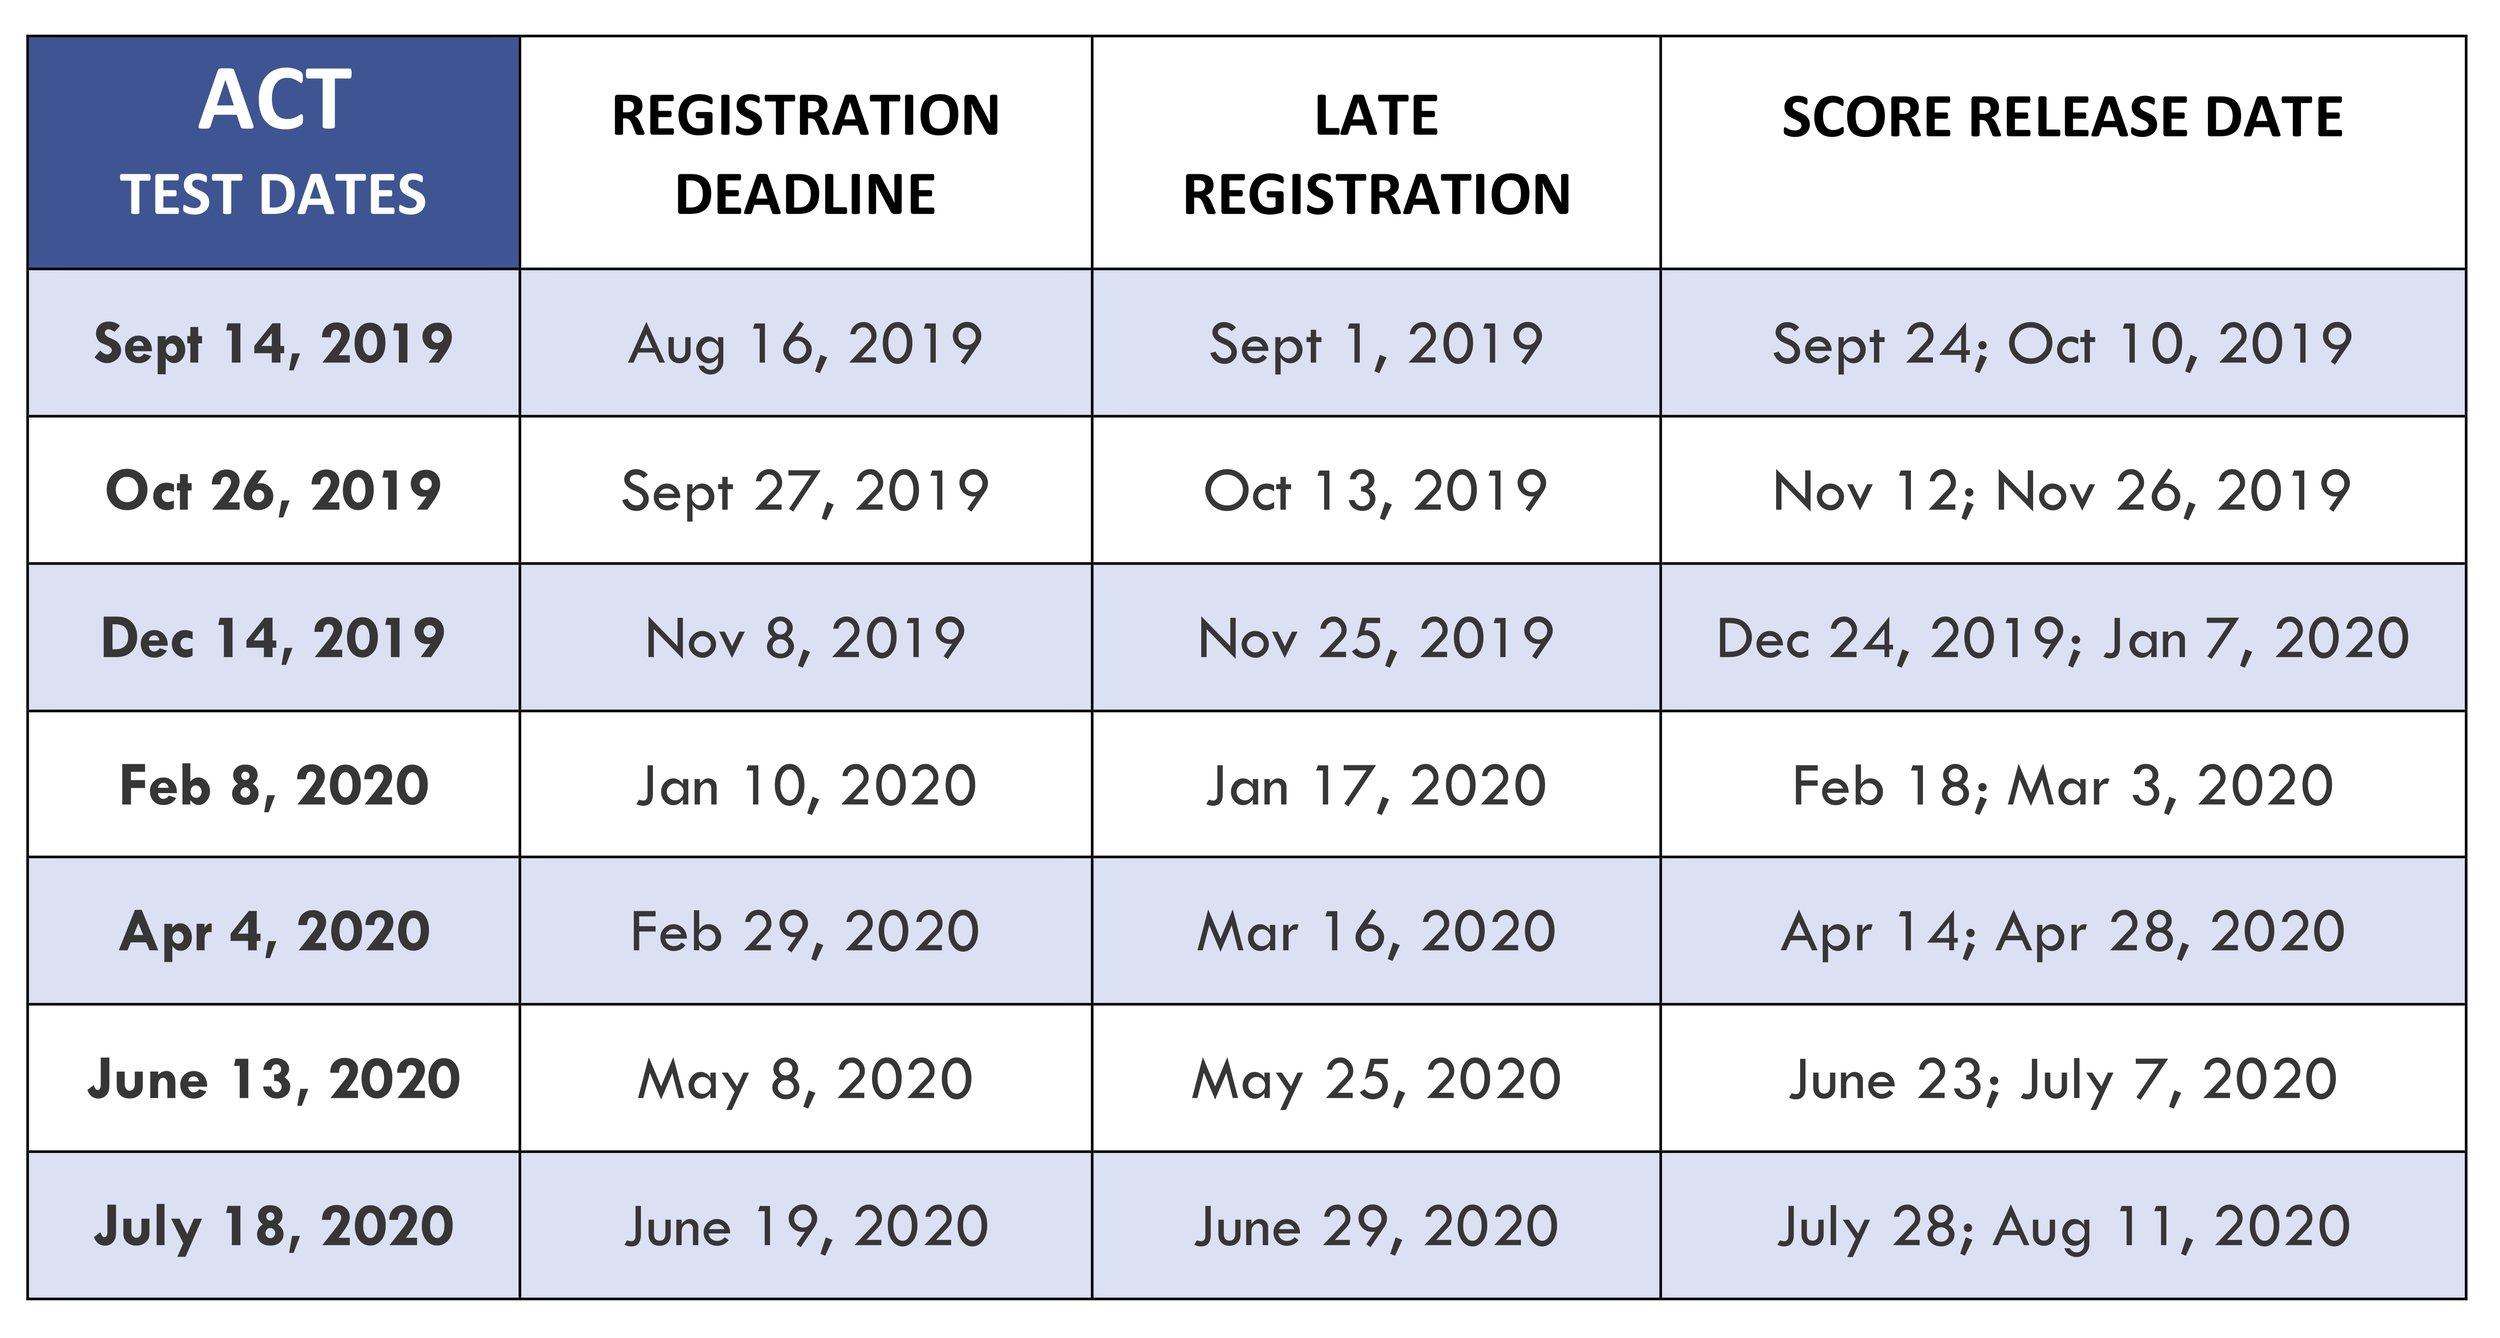 ACT Registration Website